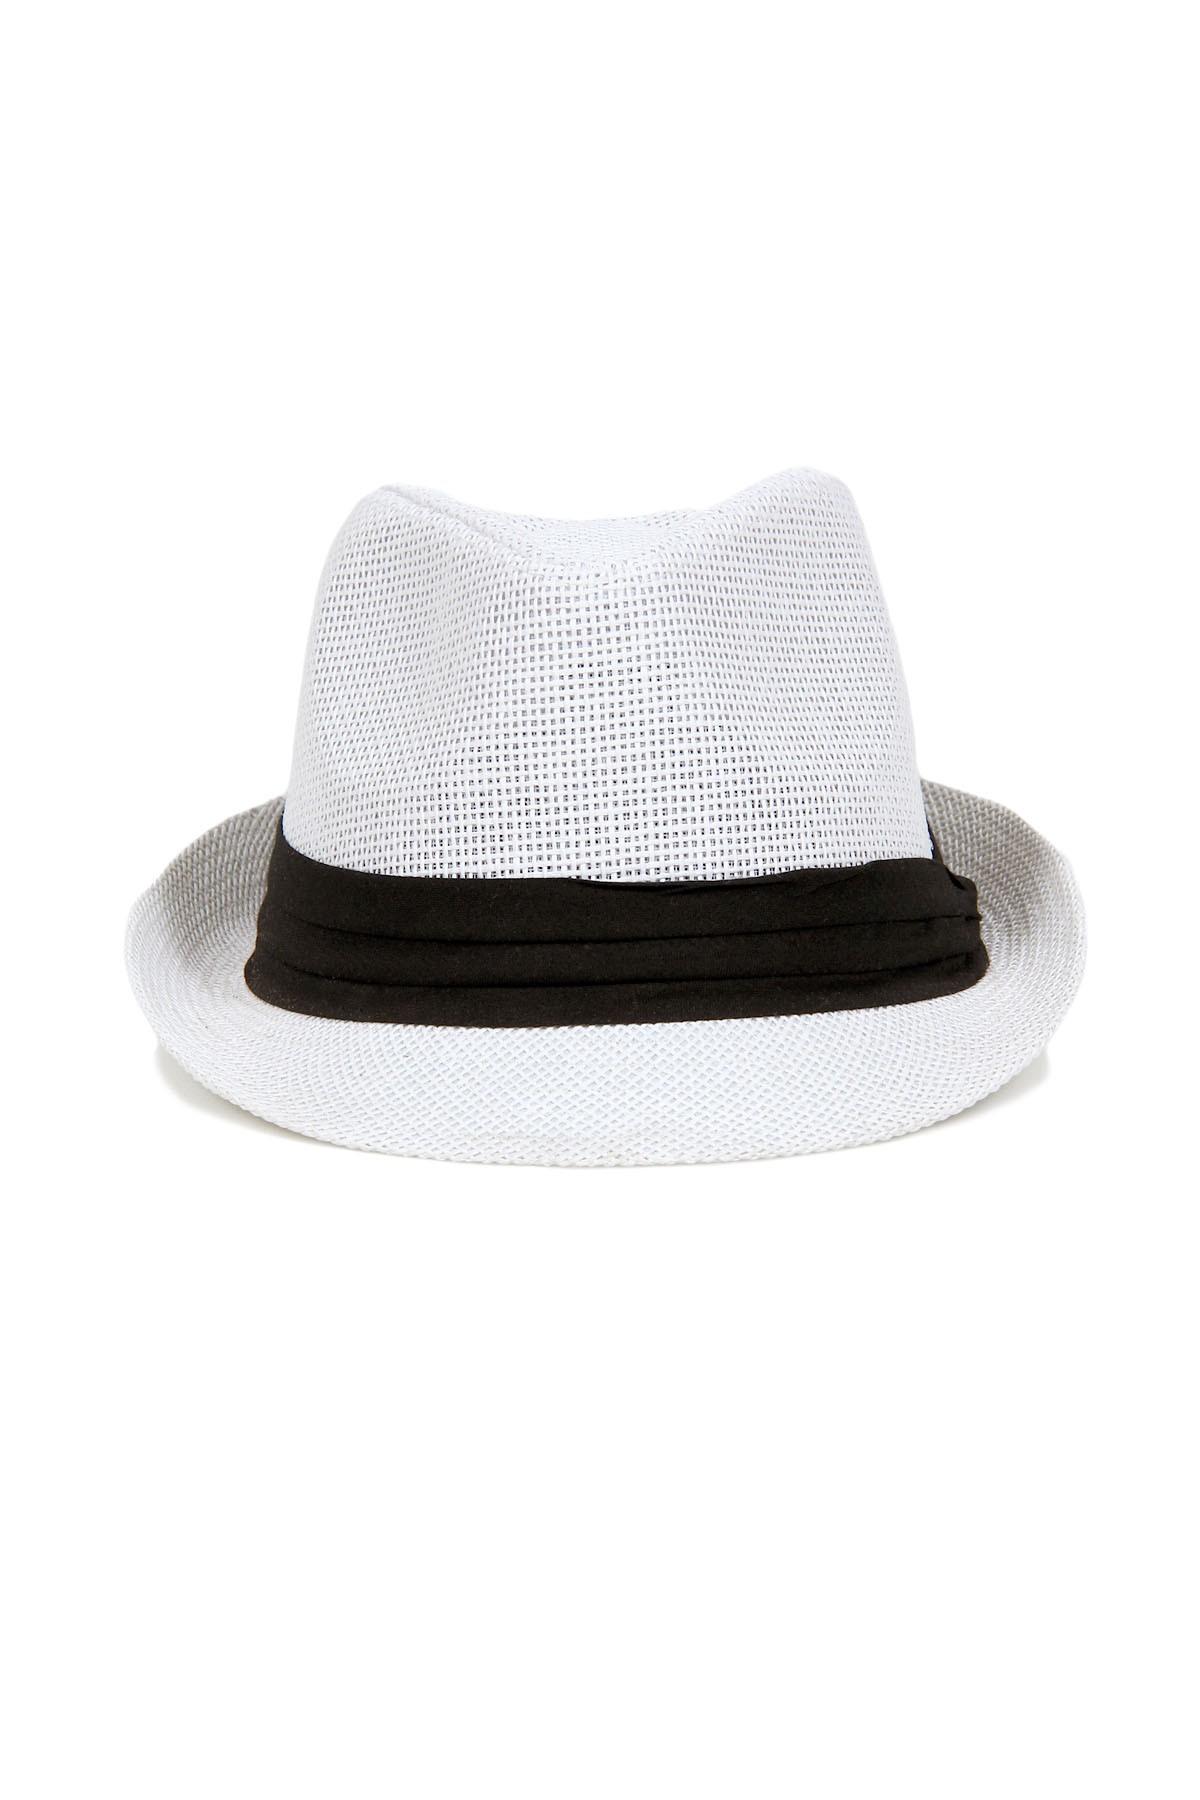 Hipster Fedora Hat - White